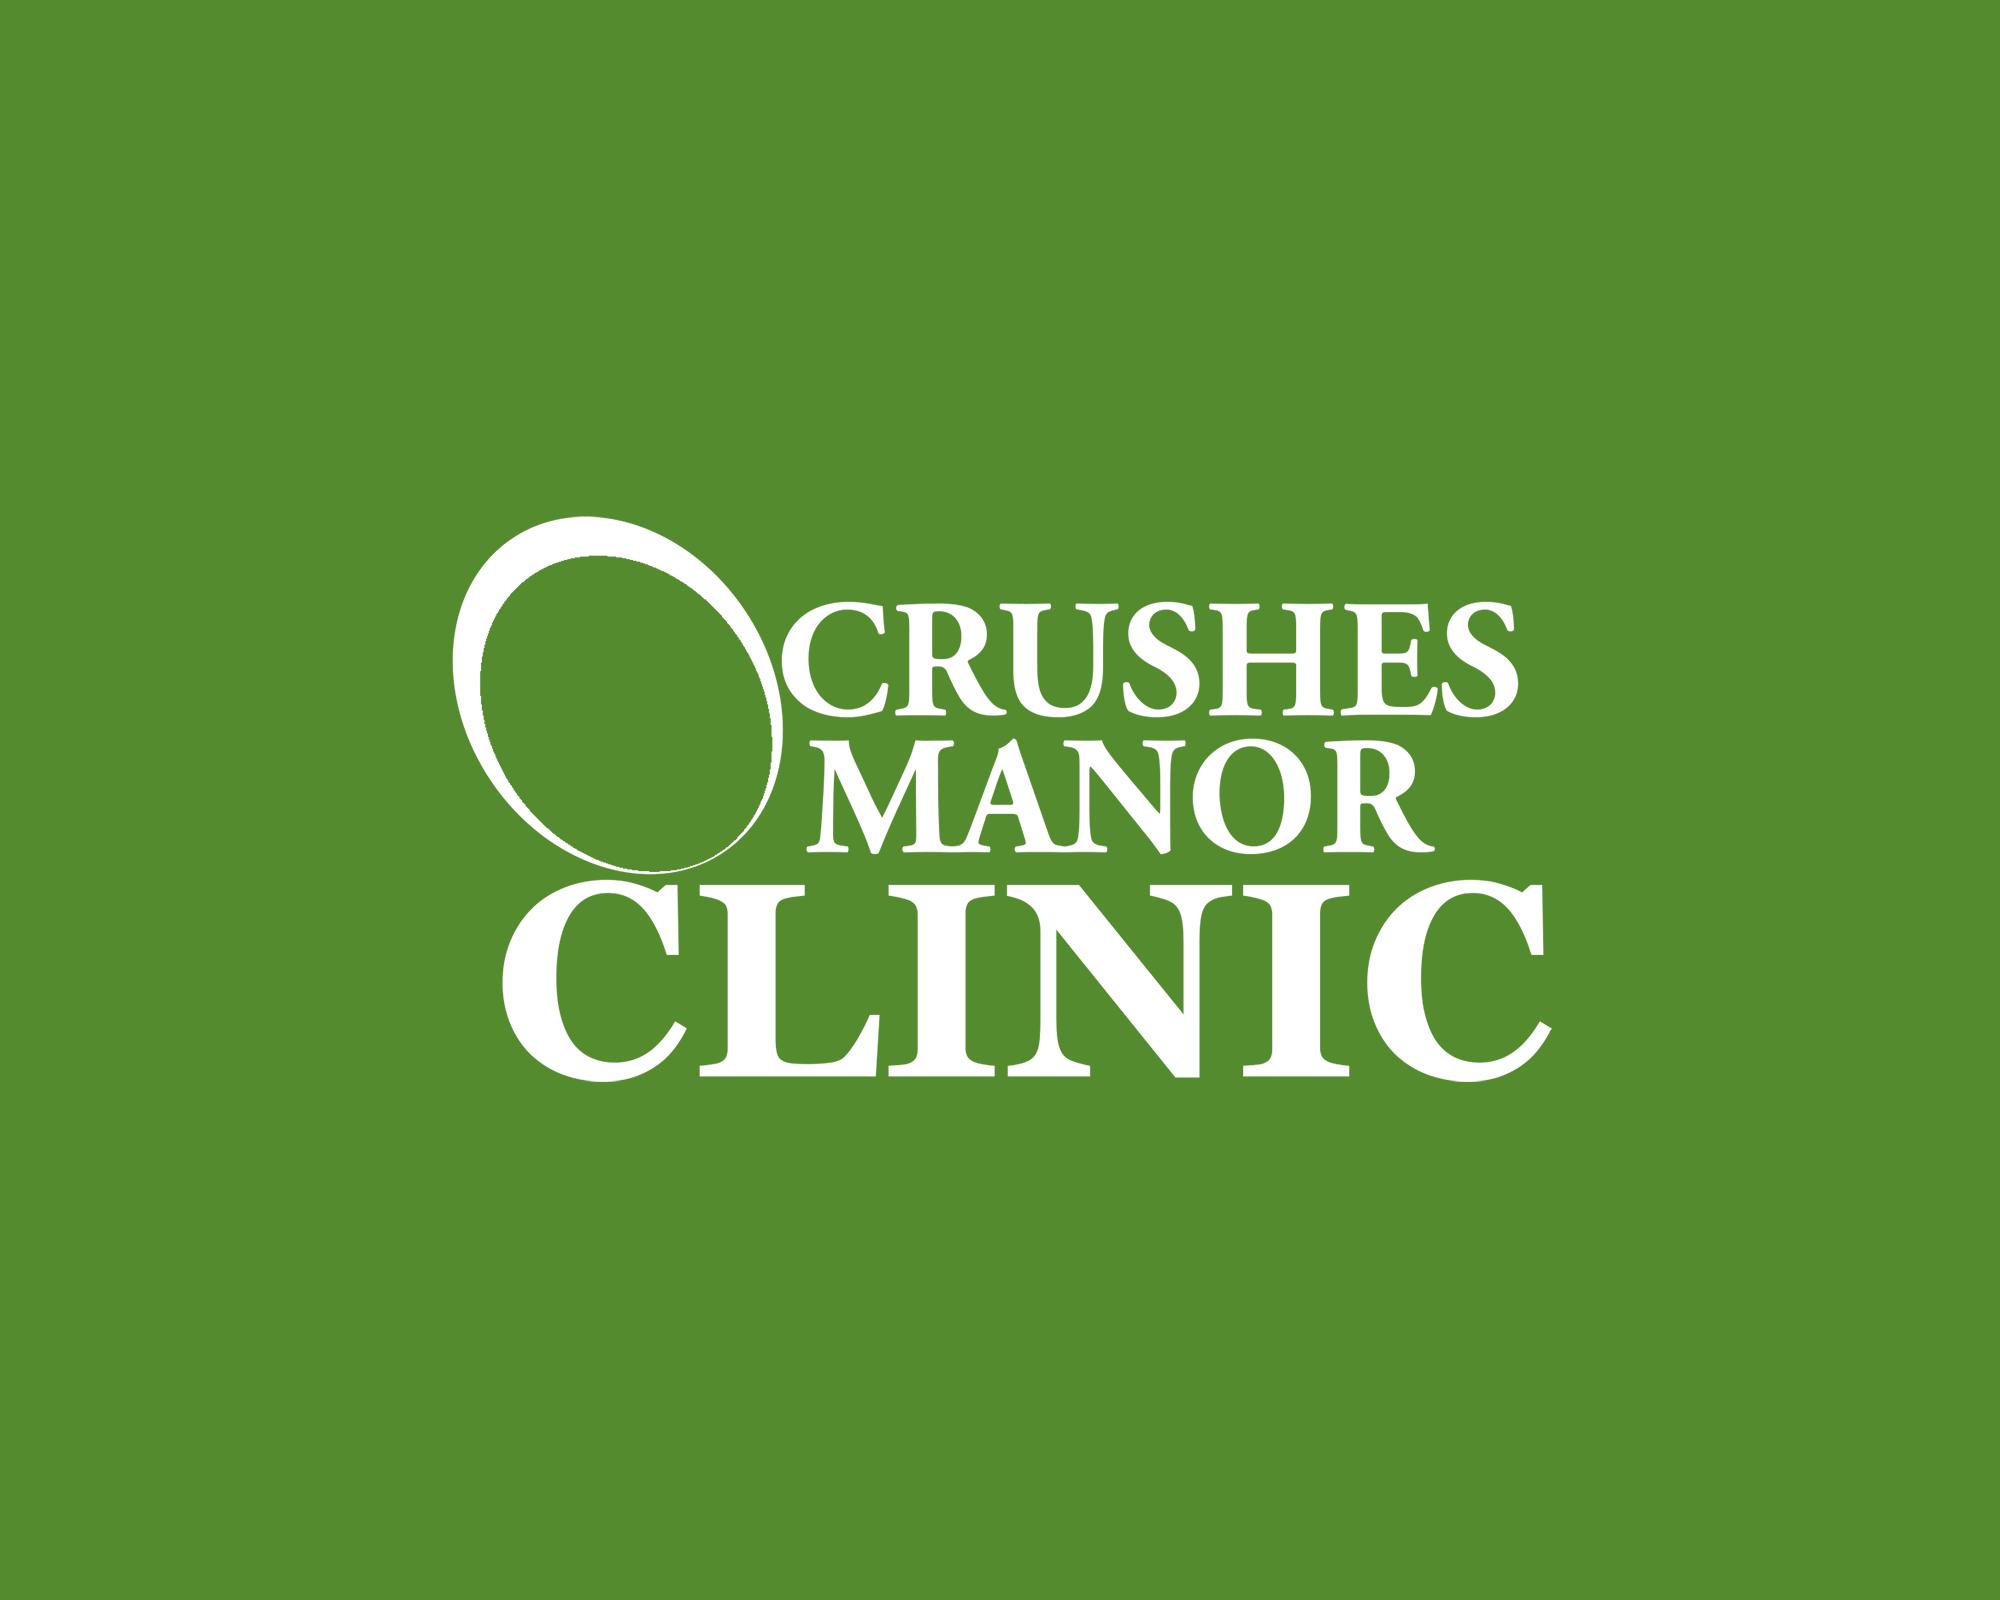 crushes manor Logo